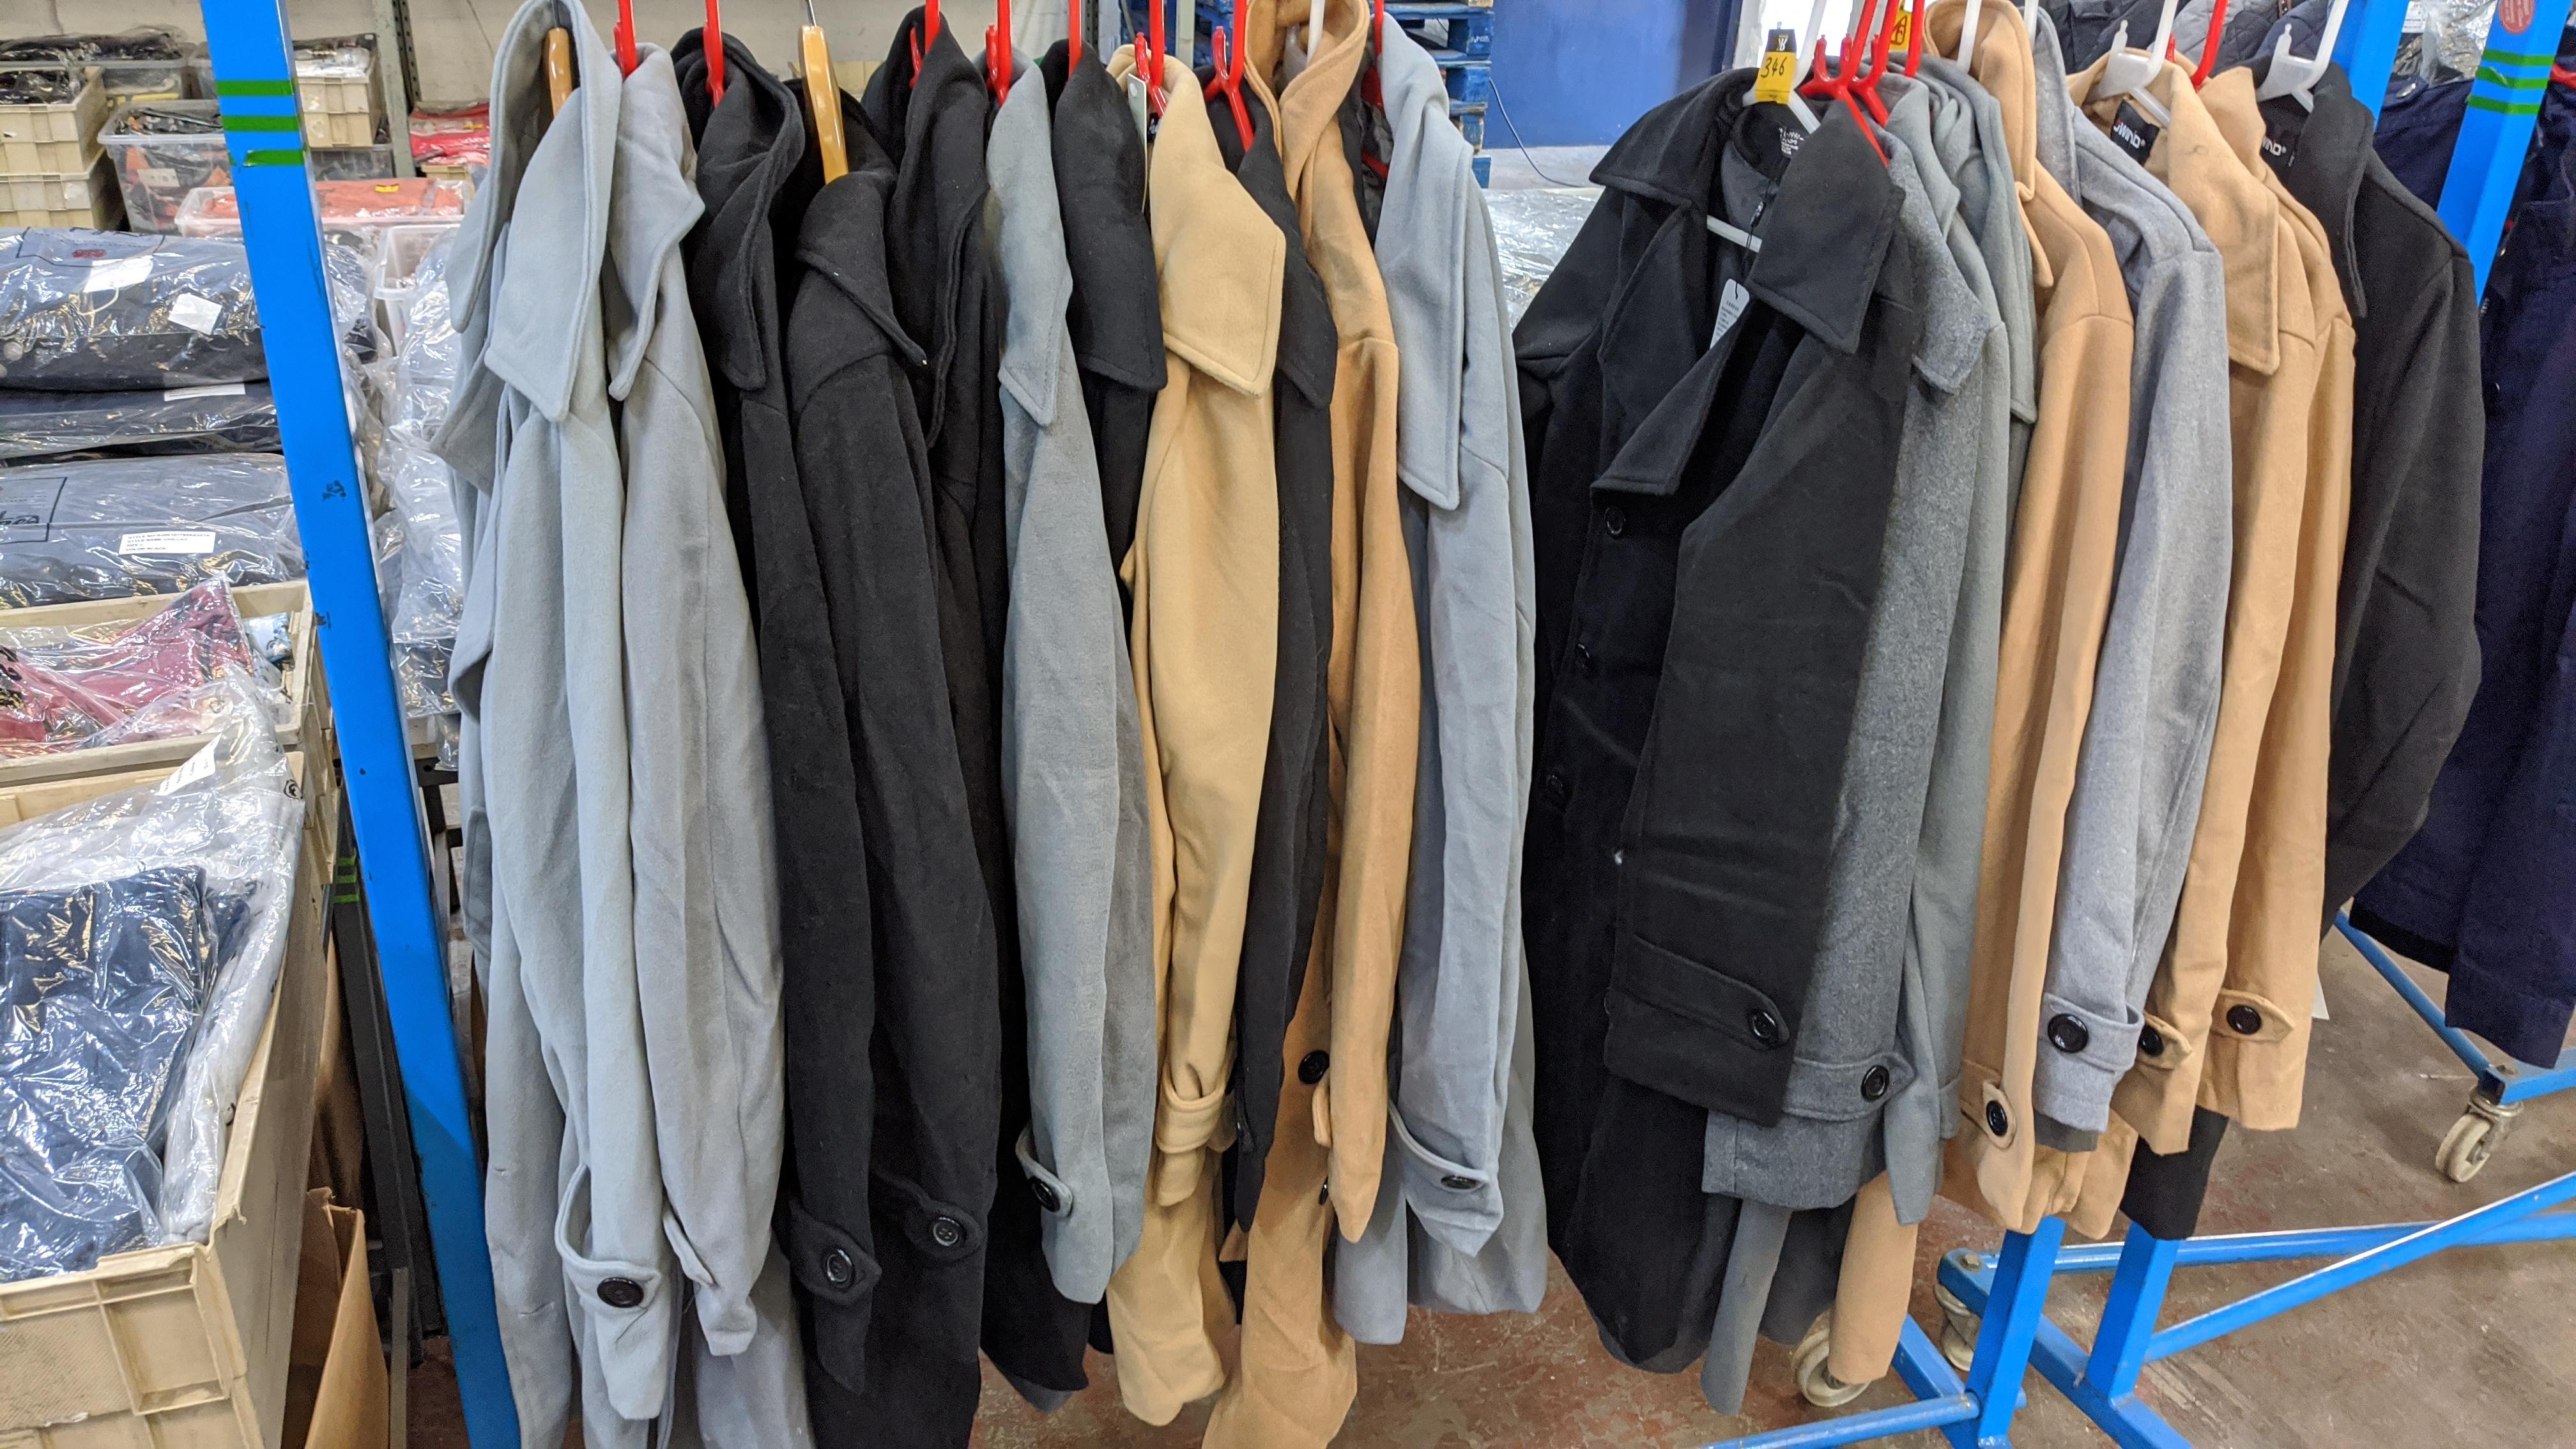 Very large quantity of primarily men's designer clothing & accessories. - Image 109 of 157